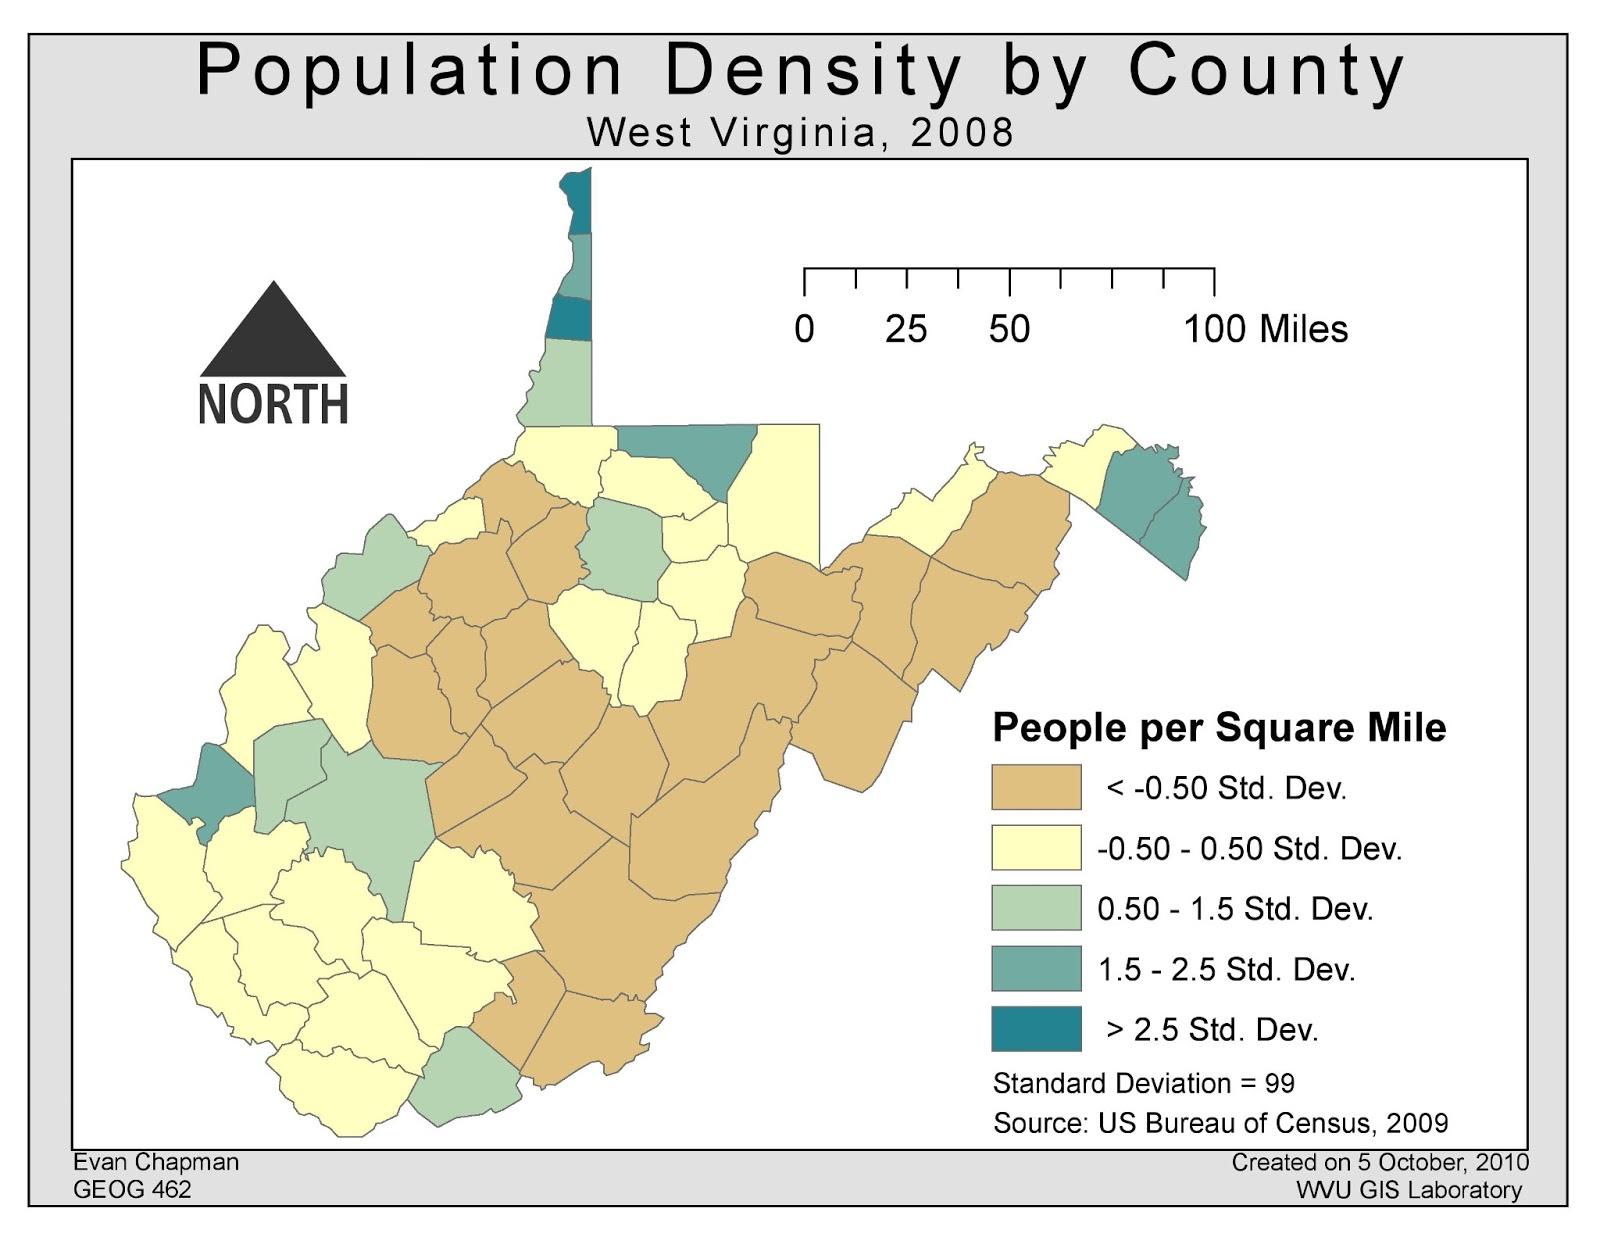 population density west virginia date october 5 2010